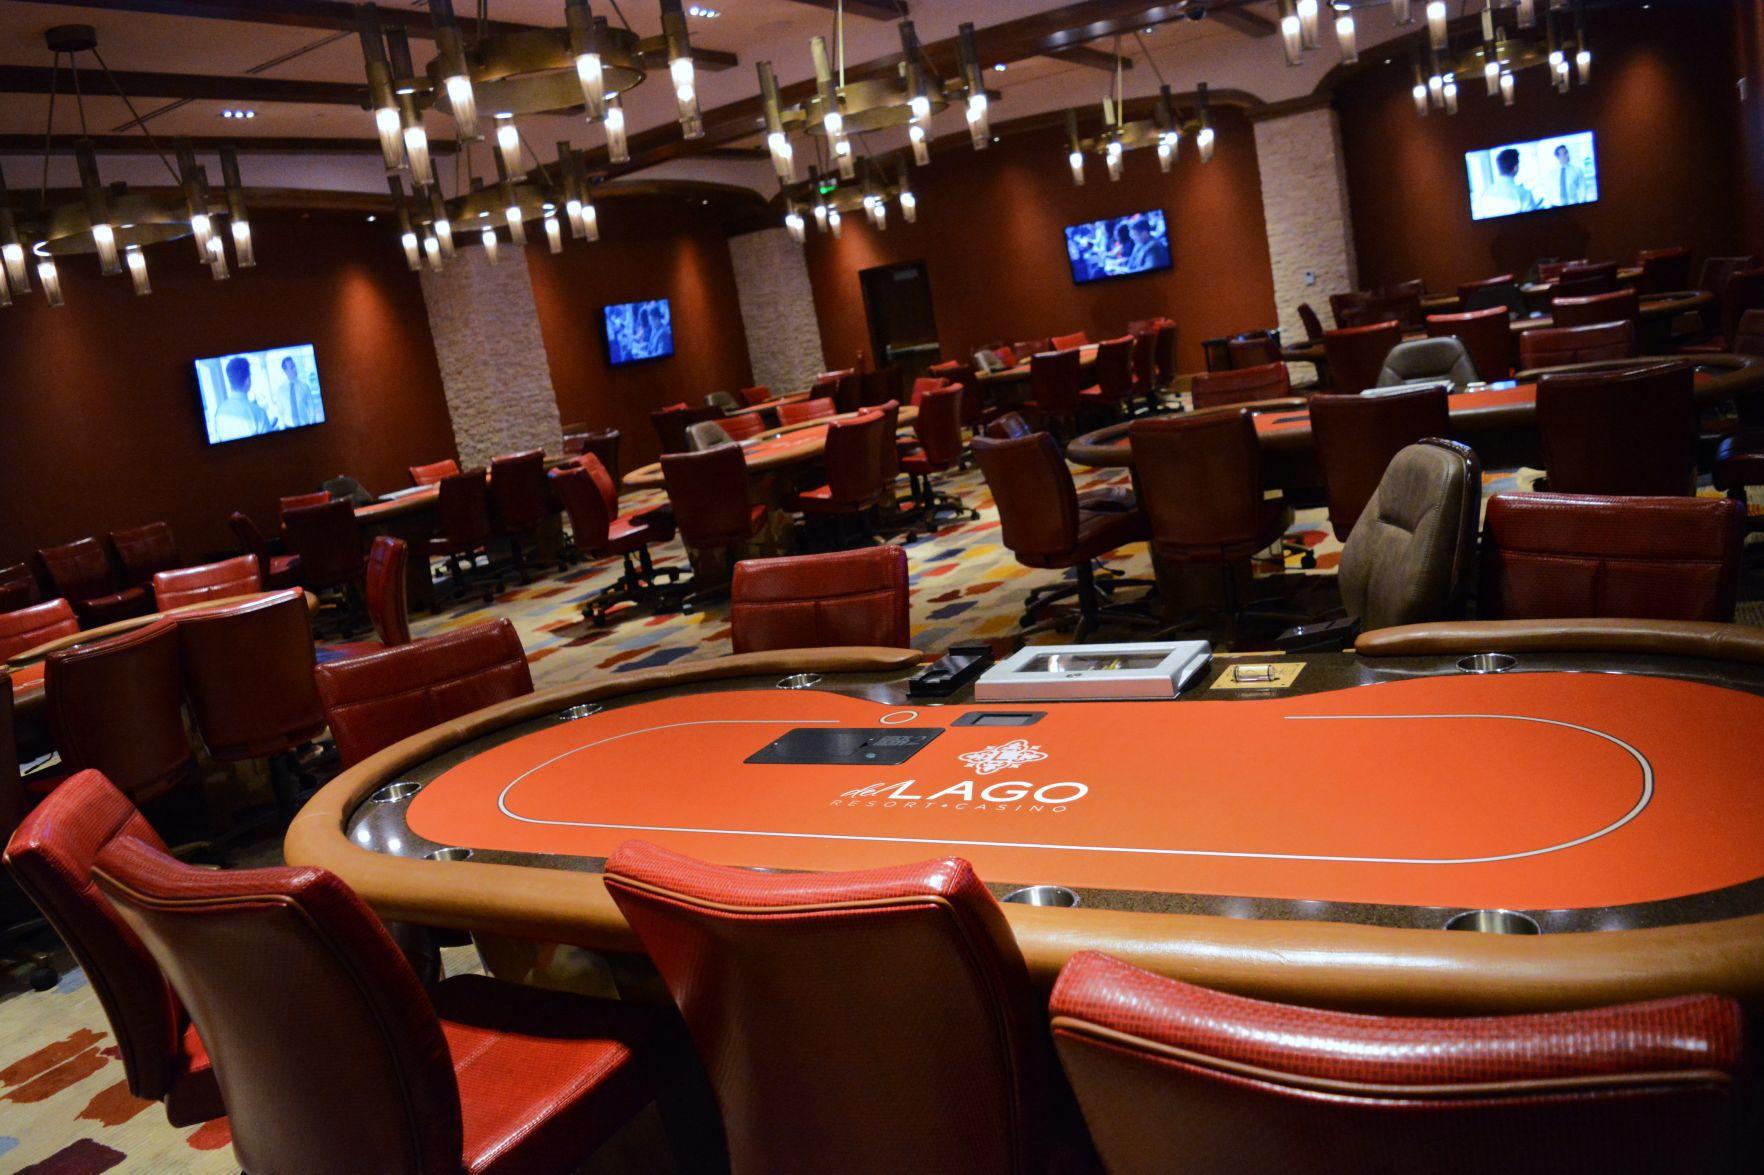 castle casino dudley